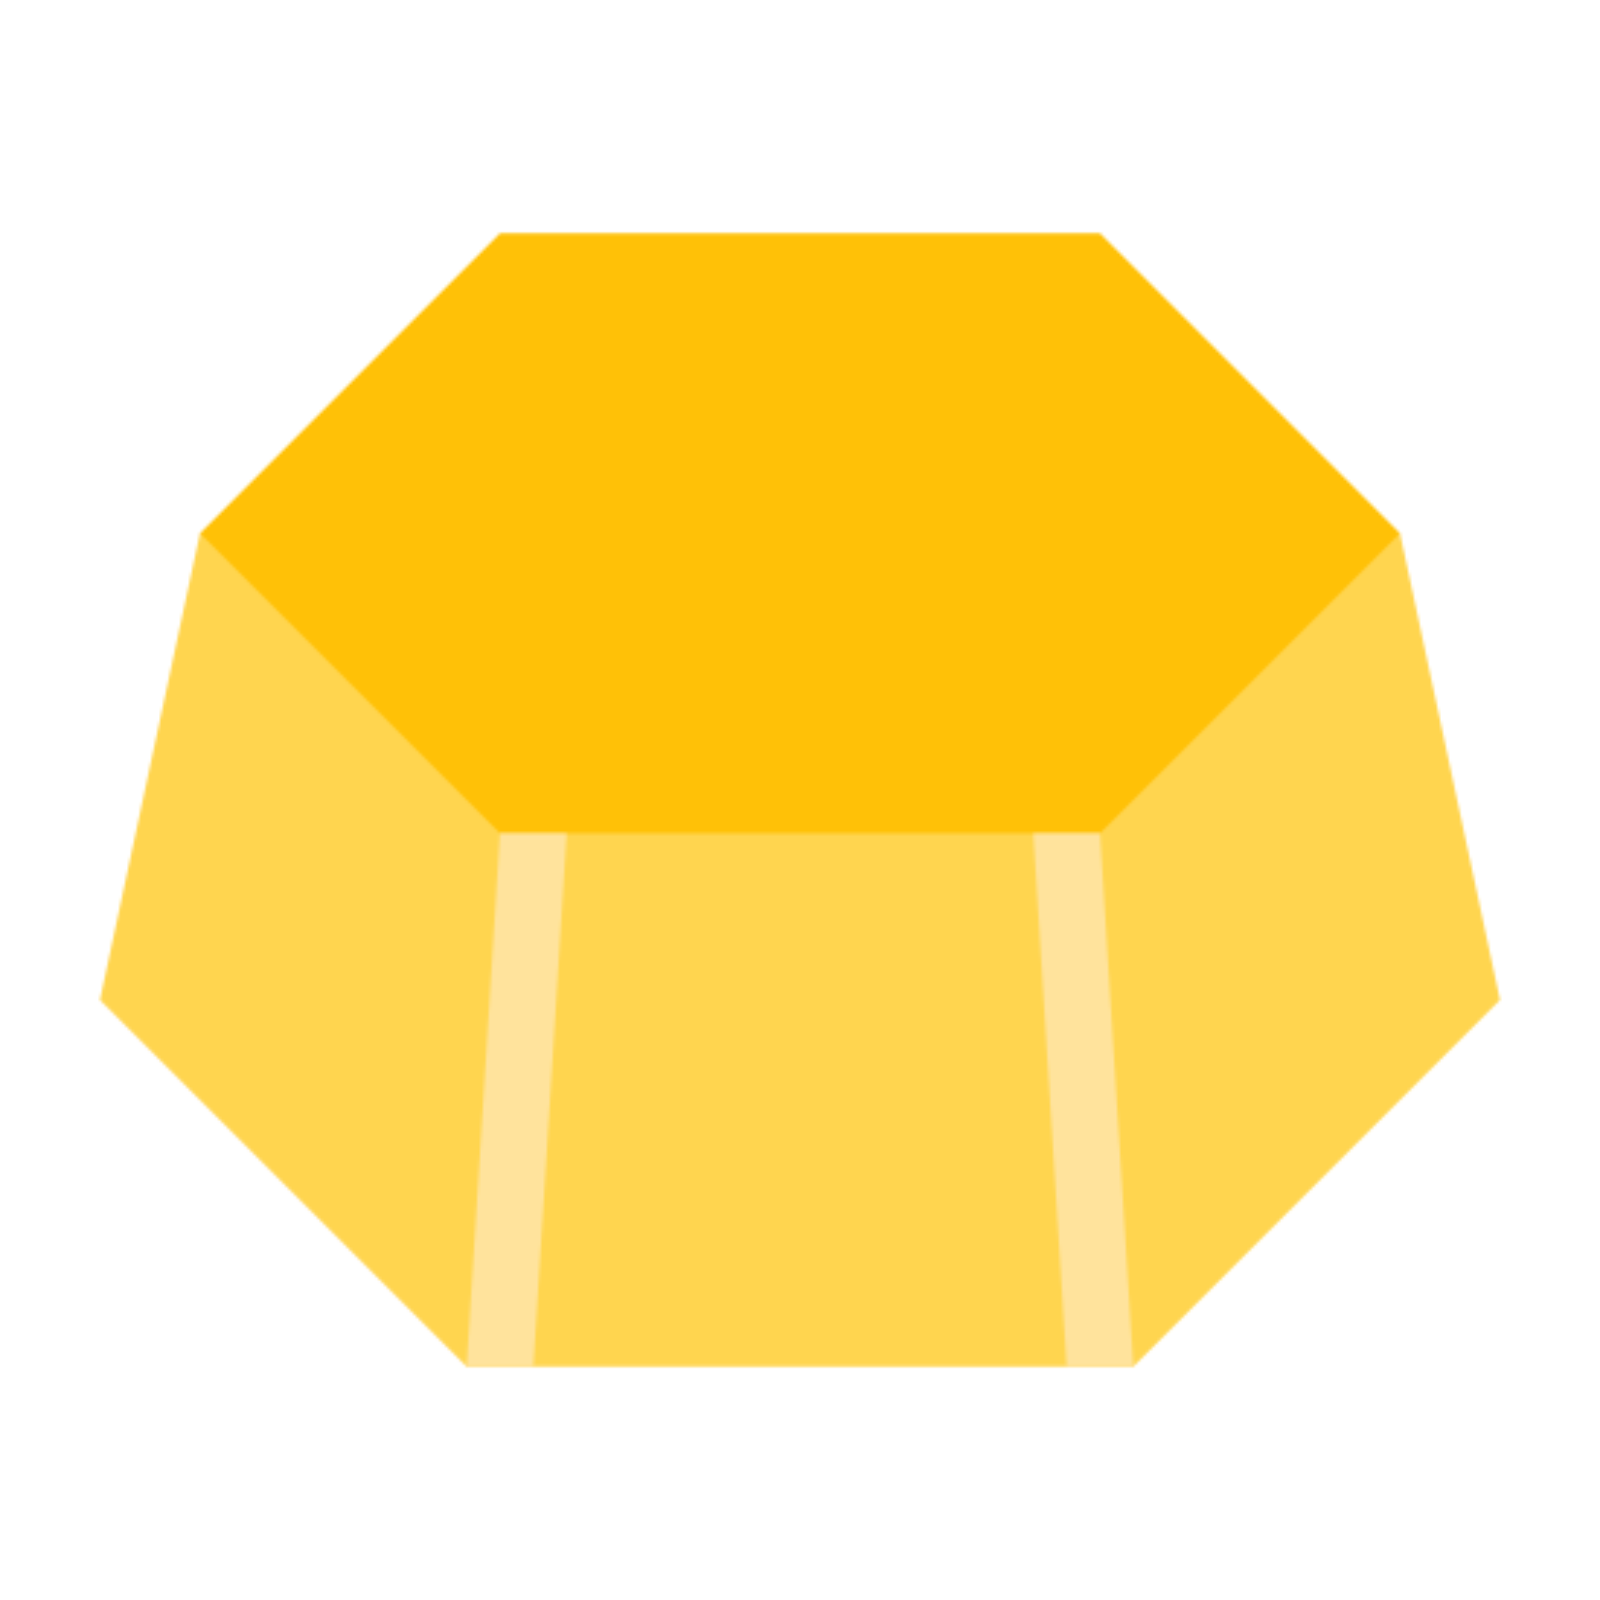 Wosk pszczeli 2 icon